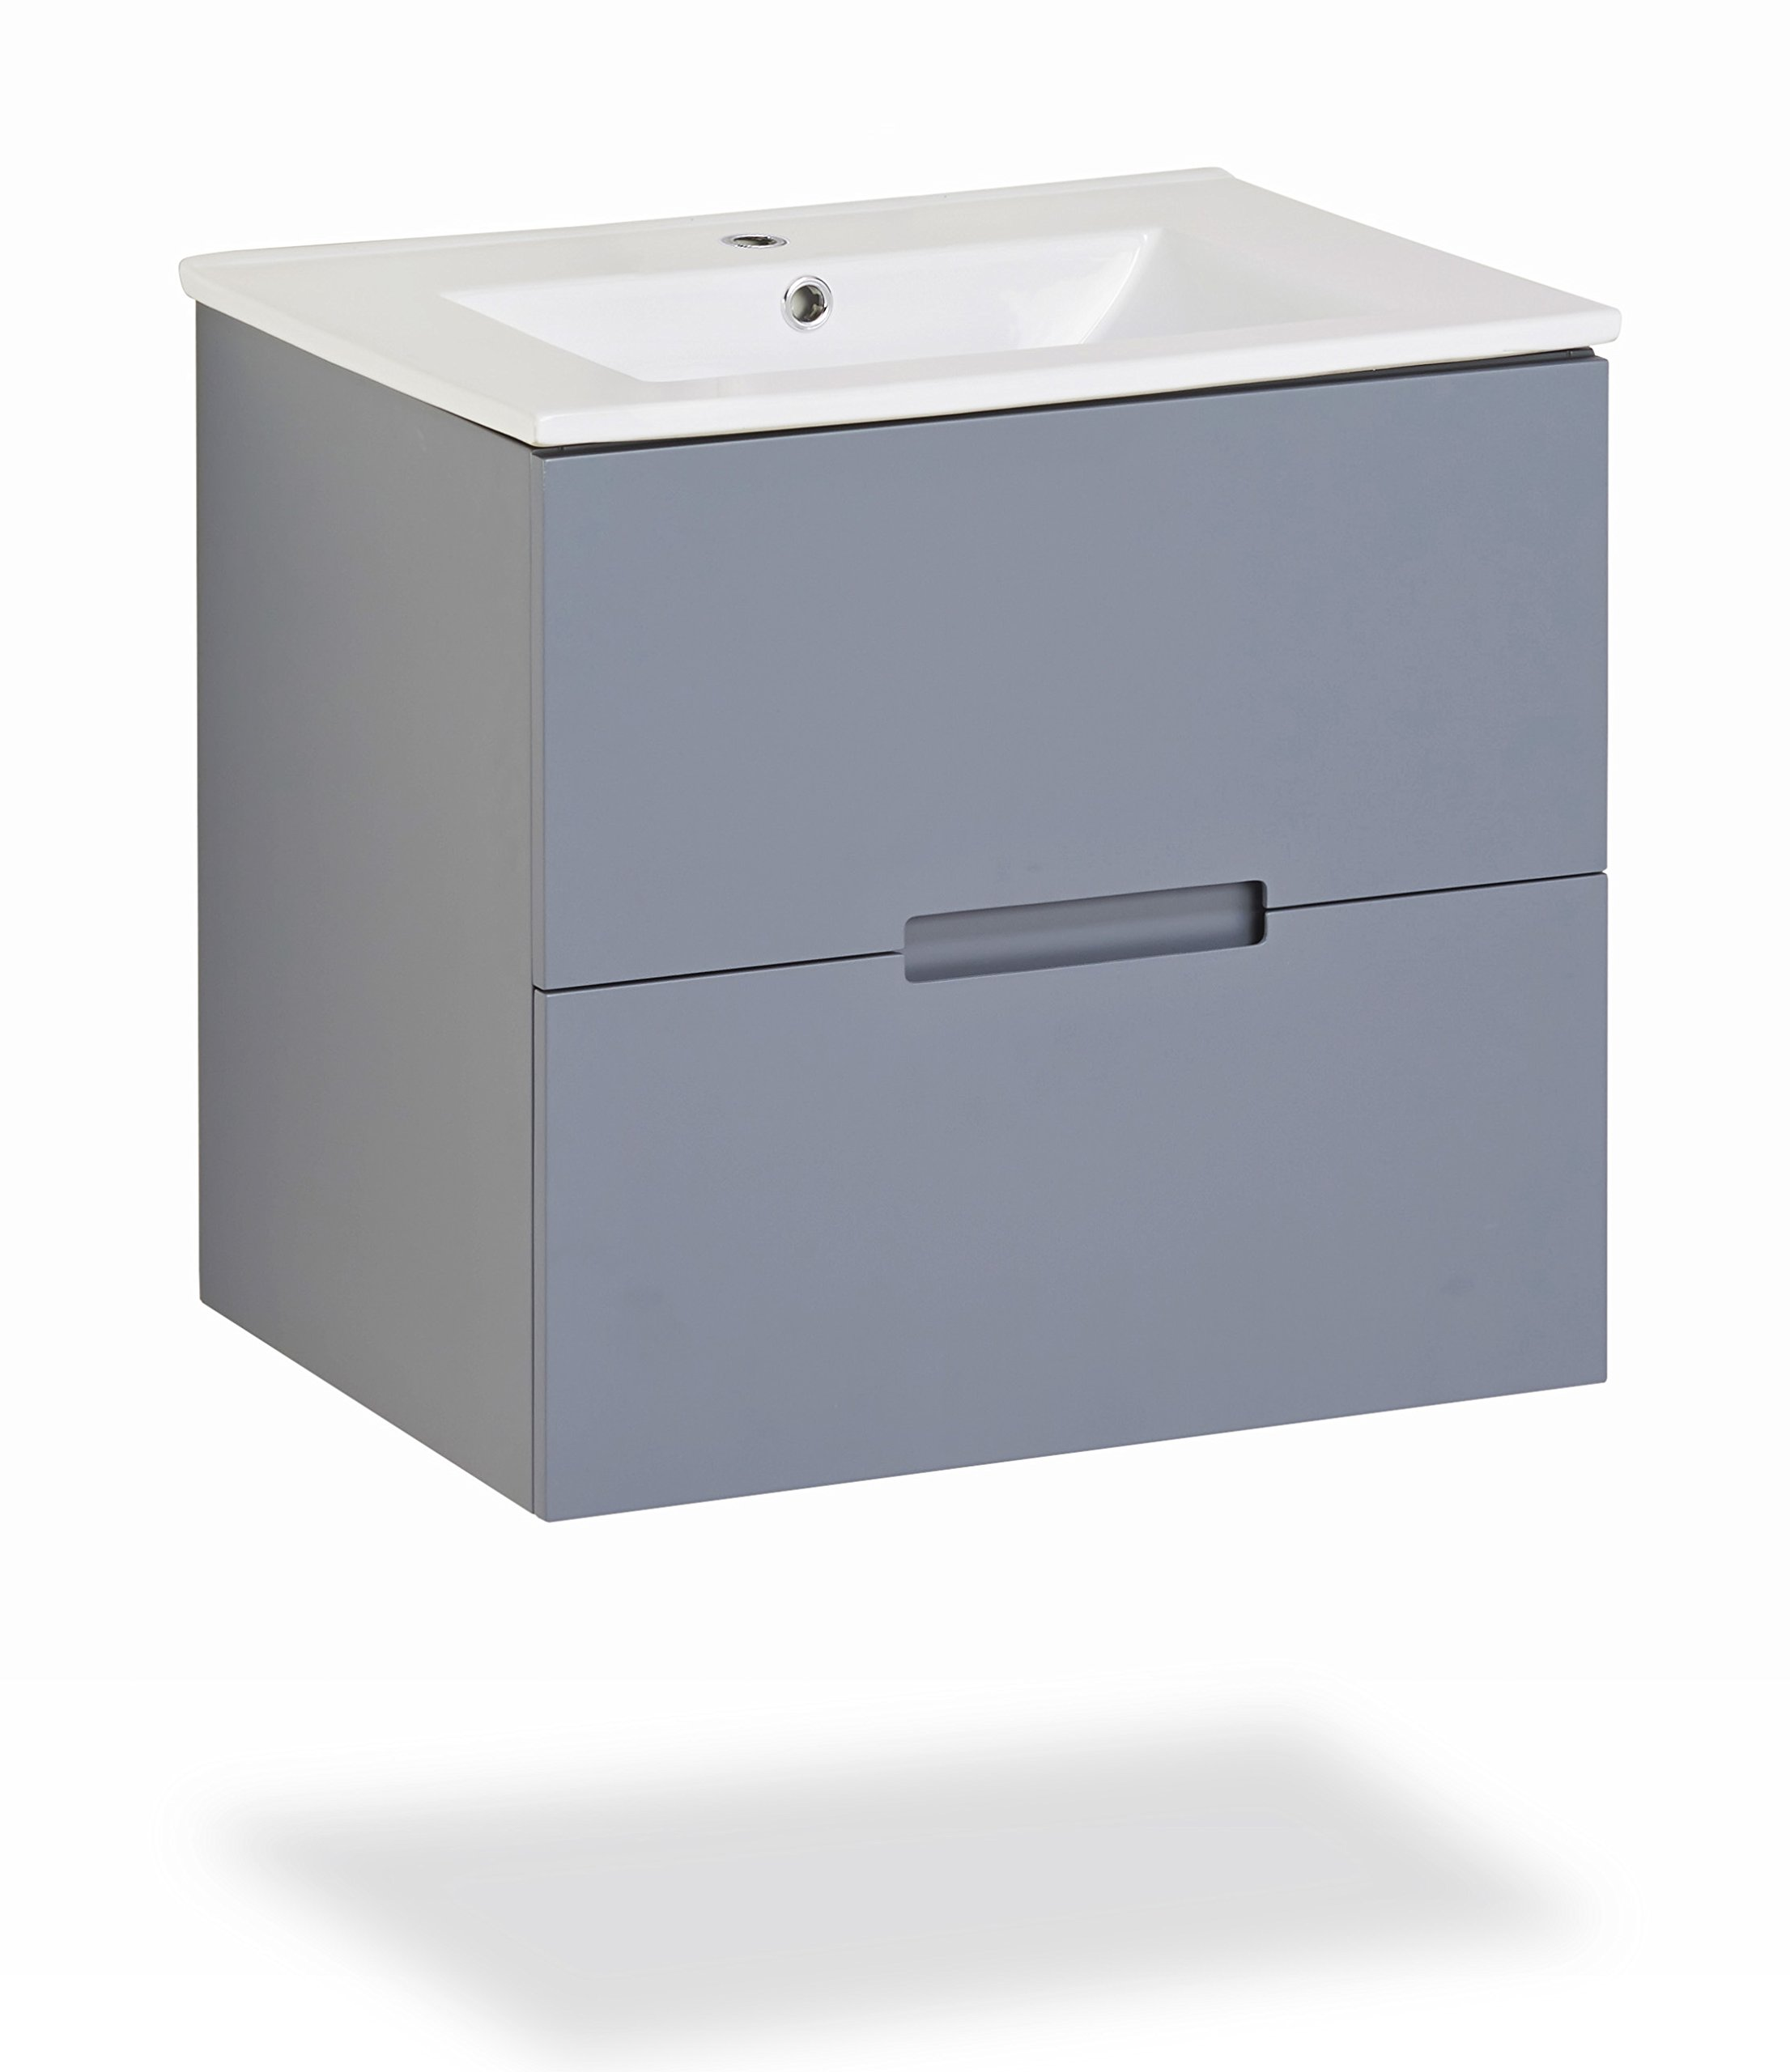 Sasha 24'' Floating Wall-Hung Gray Bathroom Vanity with Top (Sink)